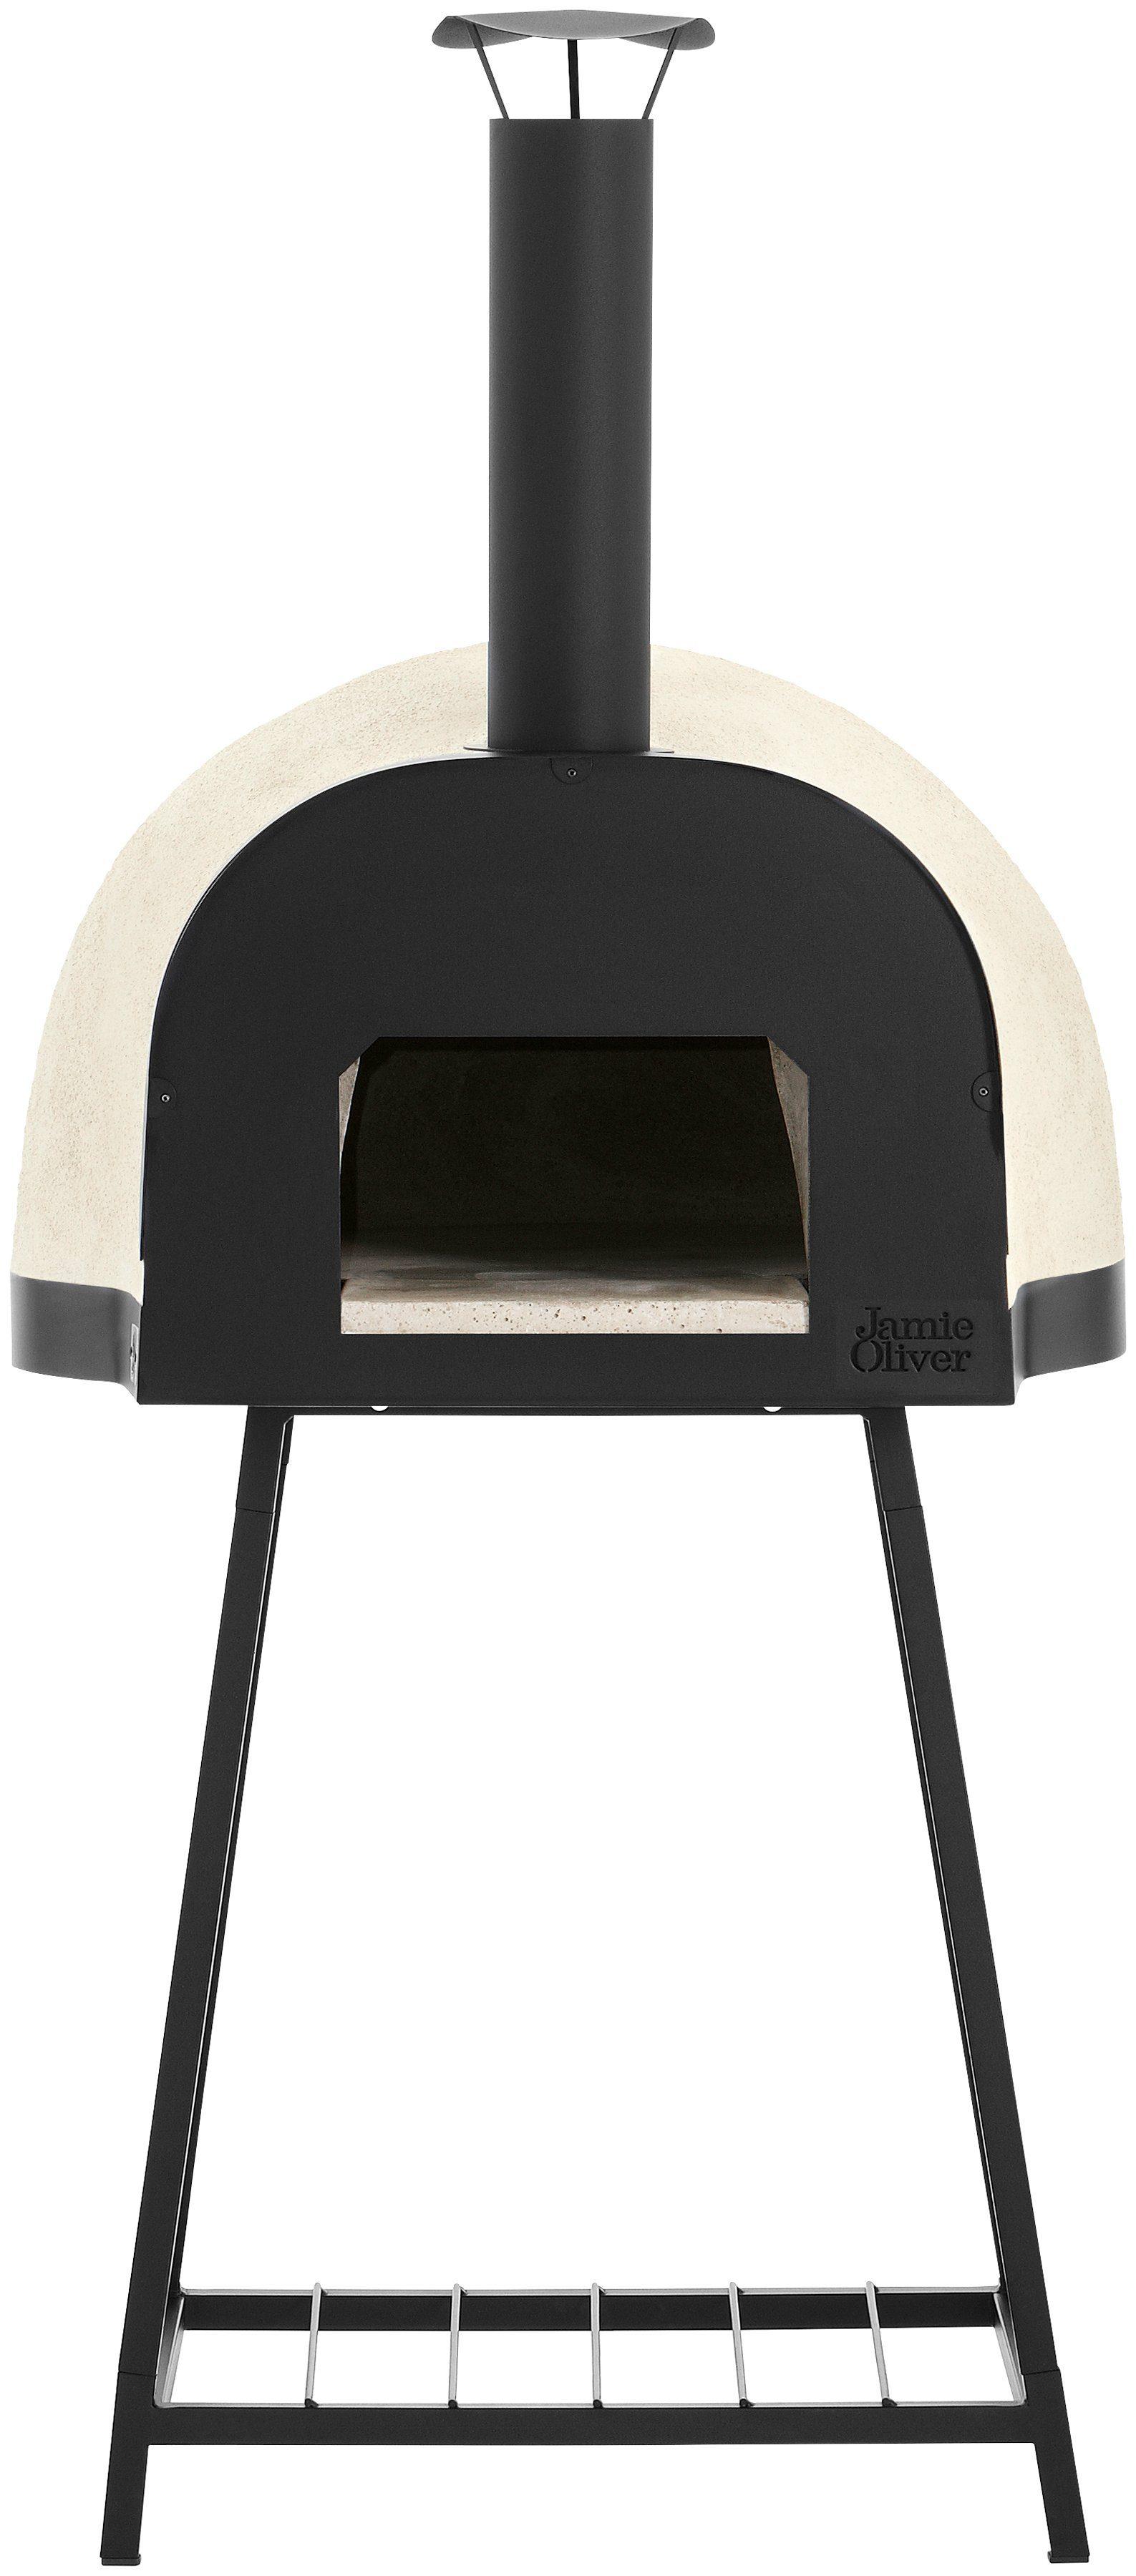 JAMIE OLIVER Pizzaofen »Dome 60 Leggero«, Ofenfläche Ø 60 cm